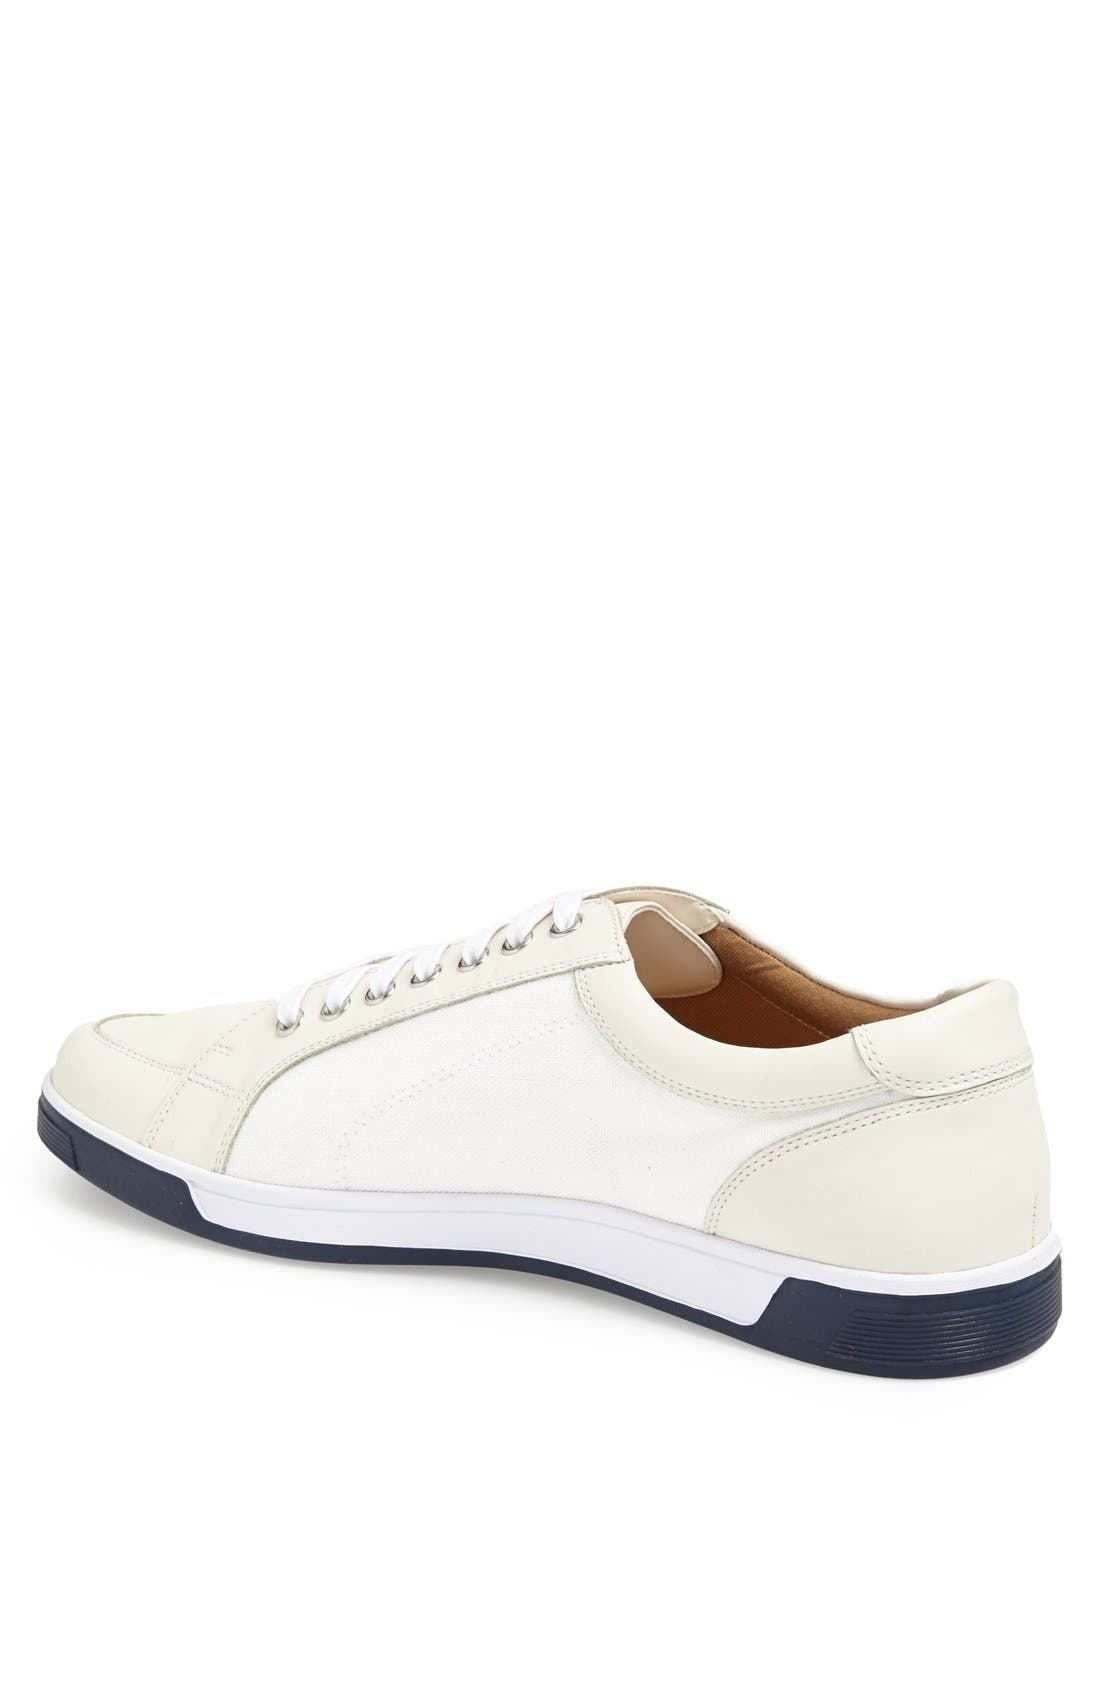 'Vartan Sport Oxford' Sneaker,                             Alternate thumbnail 24, color,